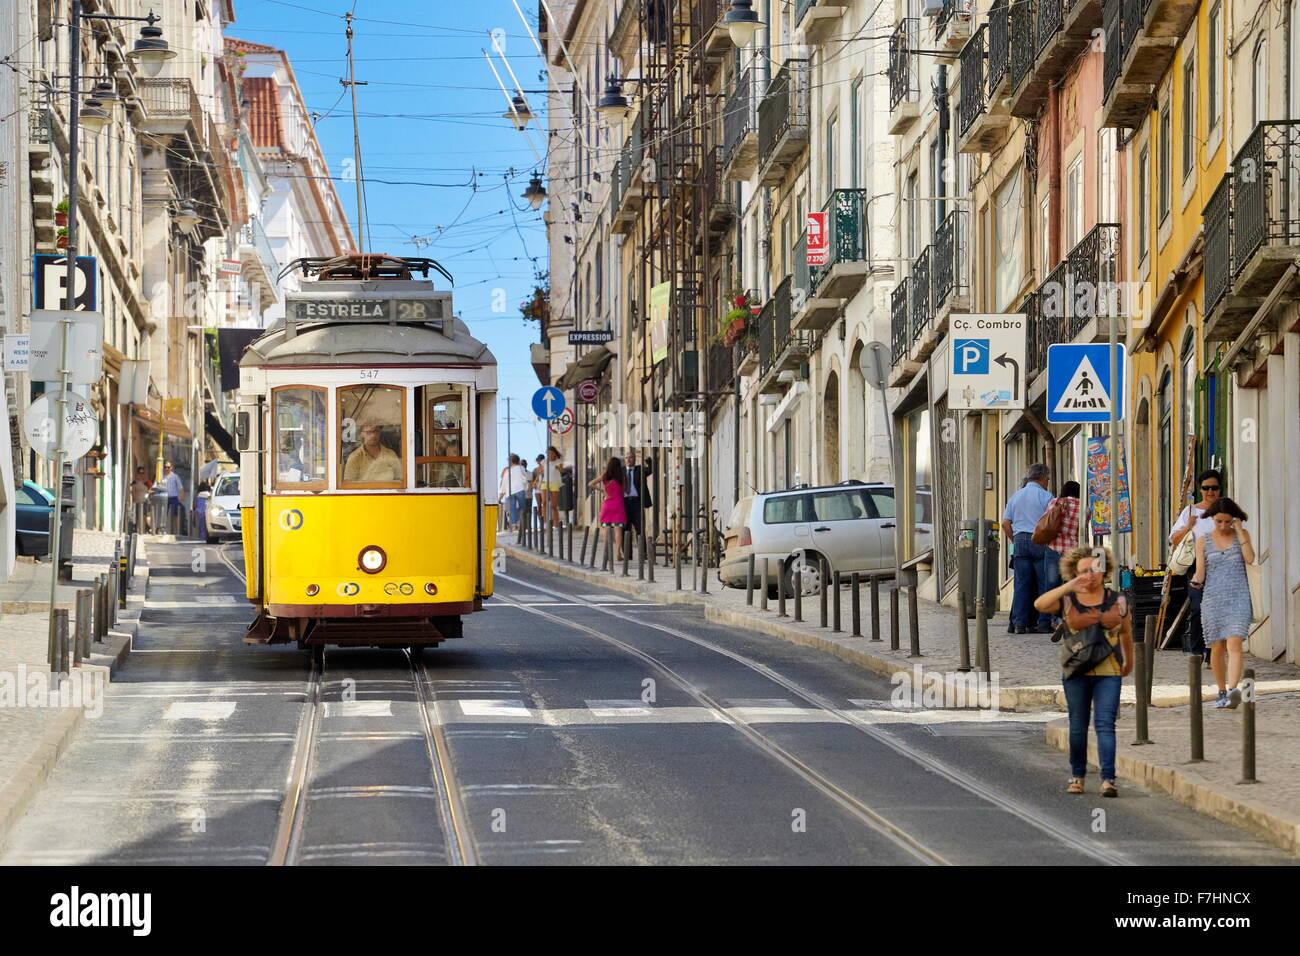 POpular transport in Lisbon - Tram 28, Portugal - Stock Image